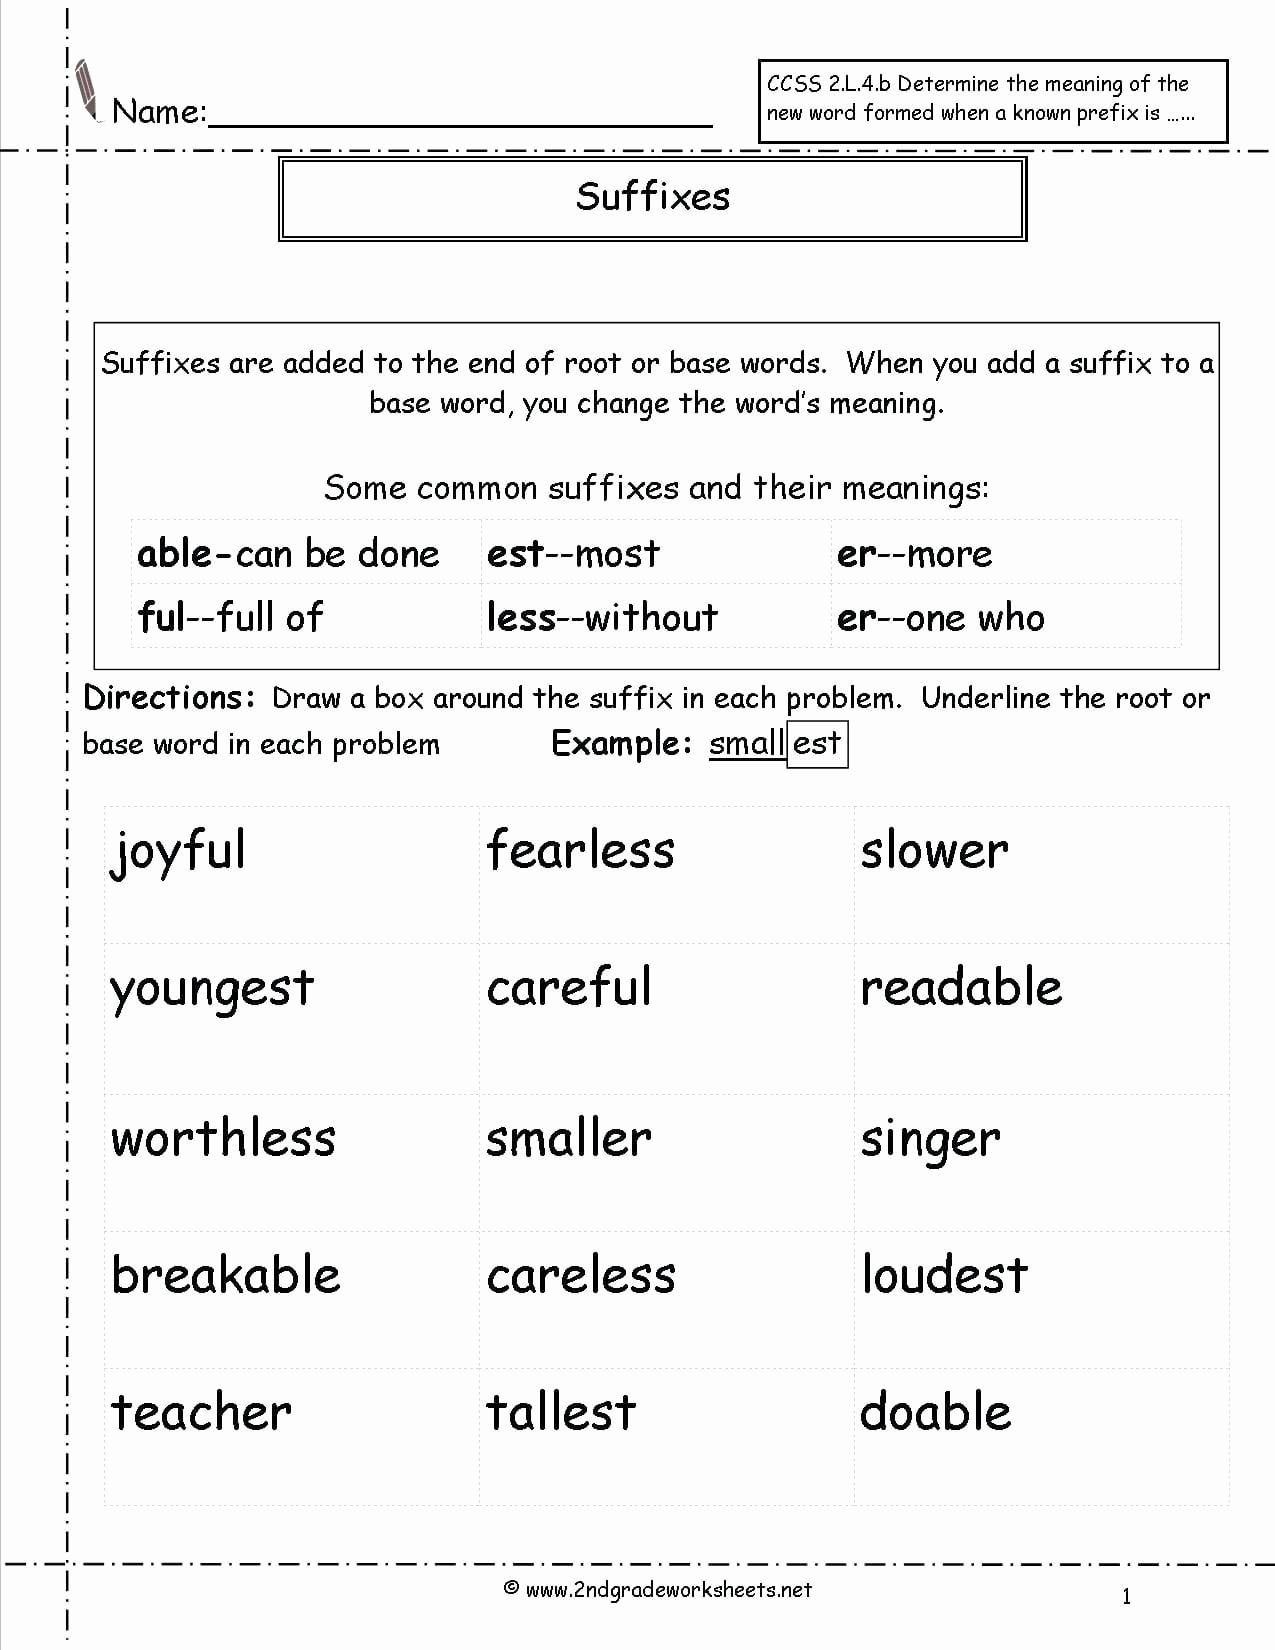 Root Word Worksheets 4th Grade Beautiful Greek and Latin Roots 4th Grade Worksheets — Db Excel